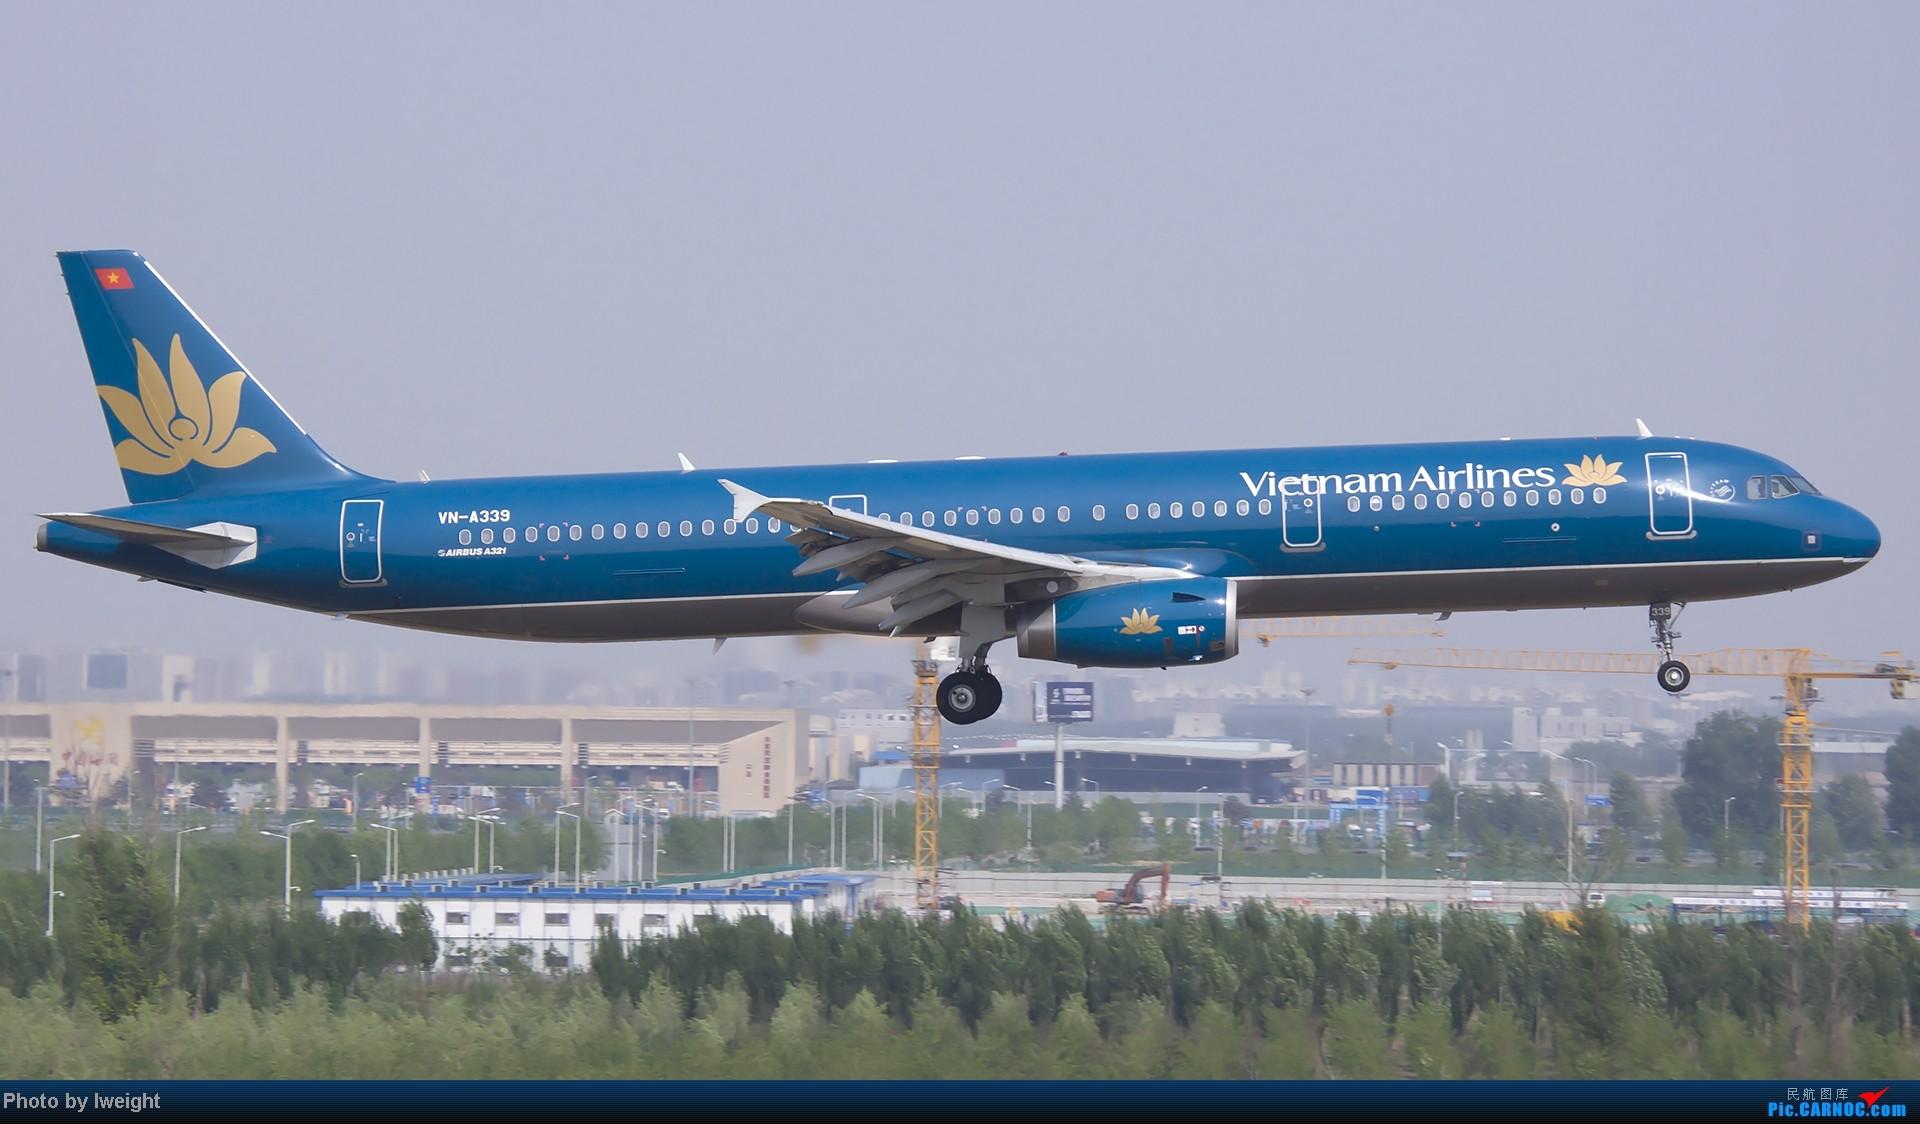 Re:[原创]错过了卡航的巴塞罗那号,只有这些大路货了,泪奔啊 AIRBUS A321-200 VN-A339 中国北京首都机场